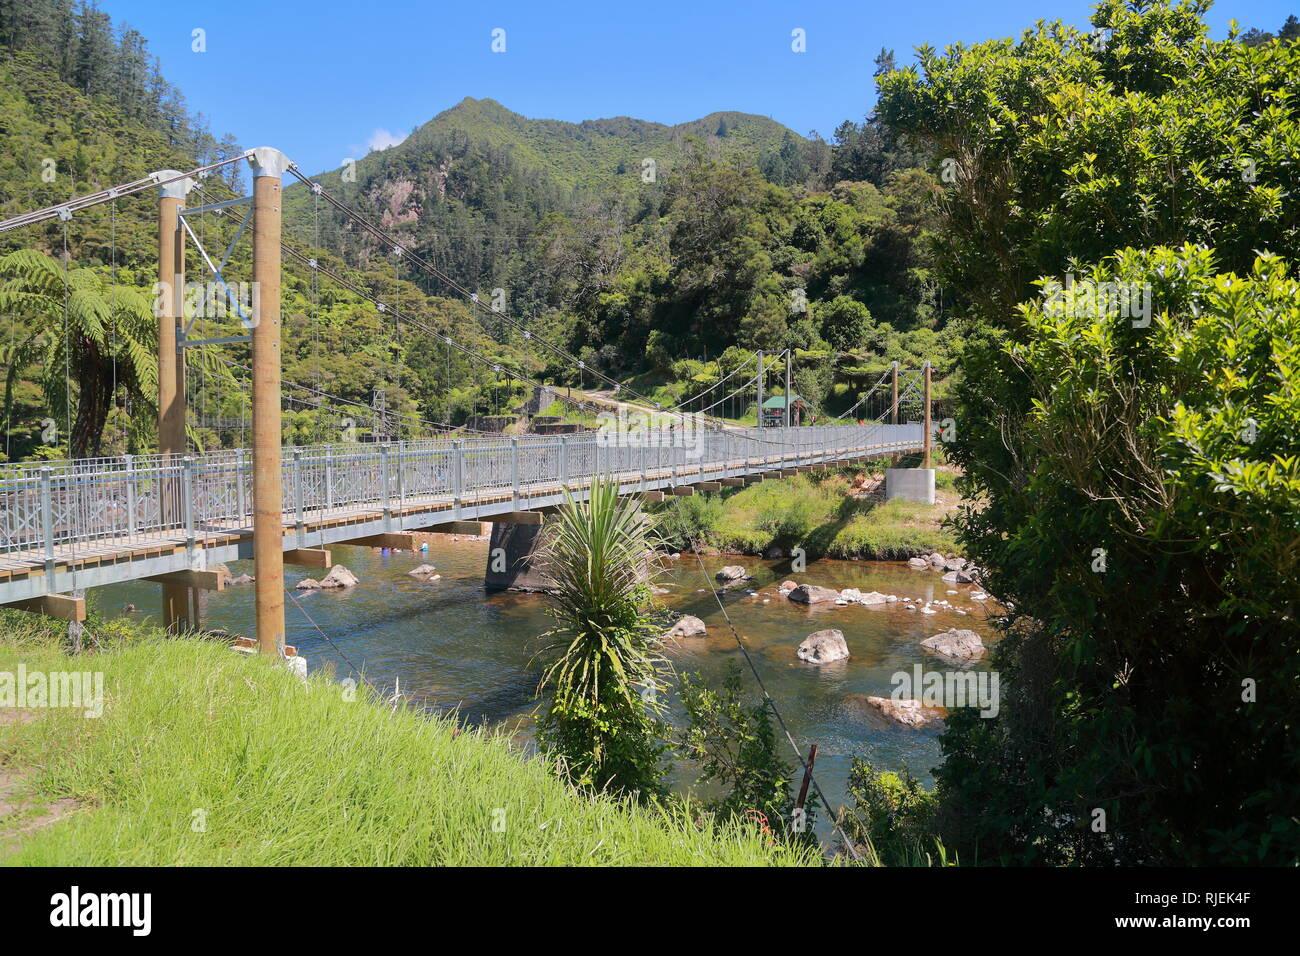 Le pont suspendu à Karangahake, Nouvelle-Zélande Photo Stock